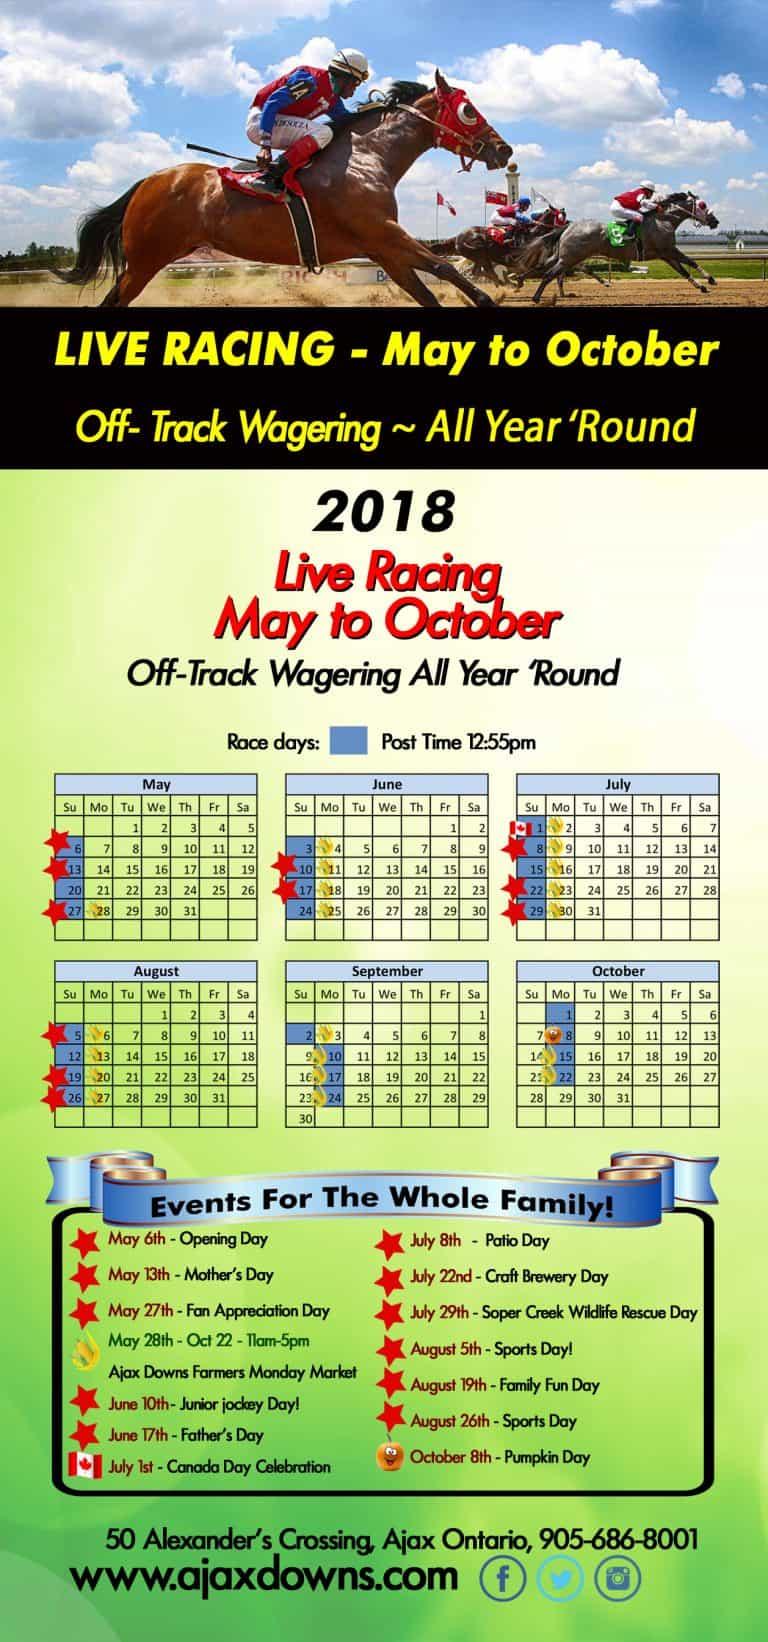 QROOI Race Dates 2018